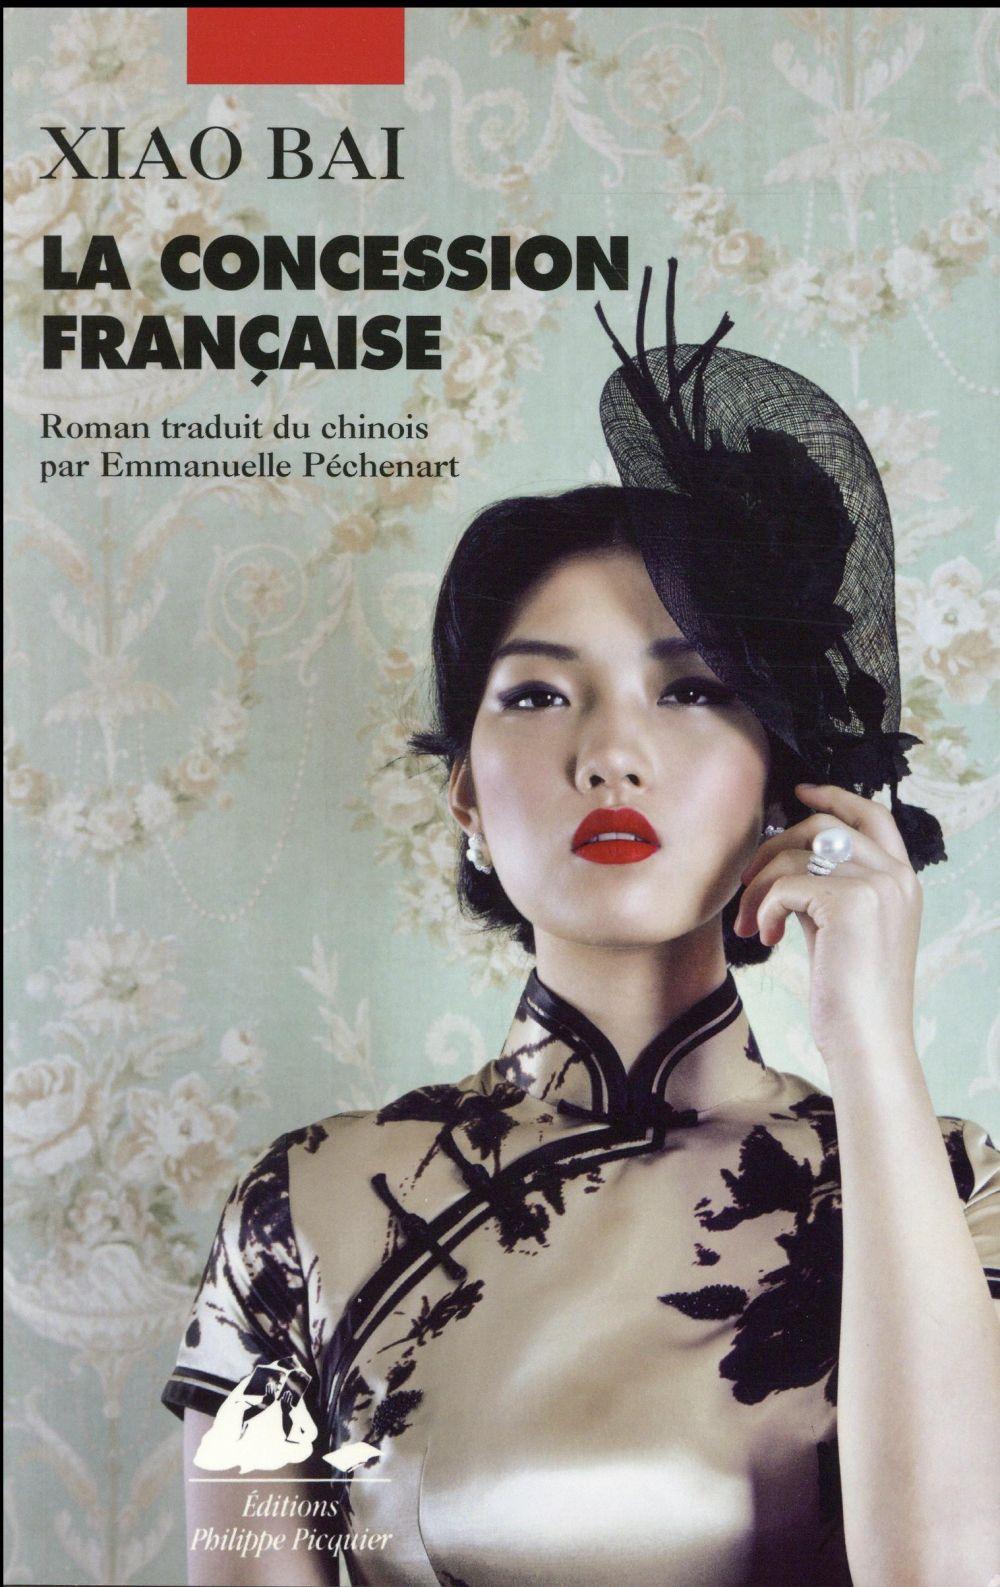 Xiao Bai - LA CONCESSION FRANCAISE